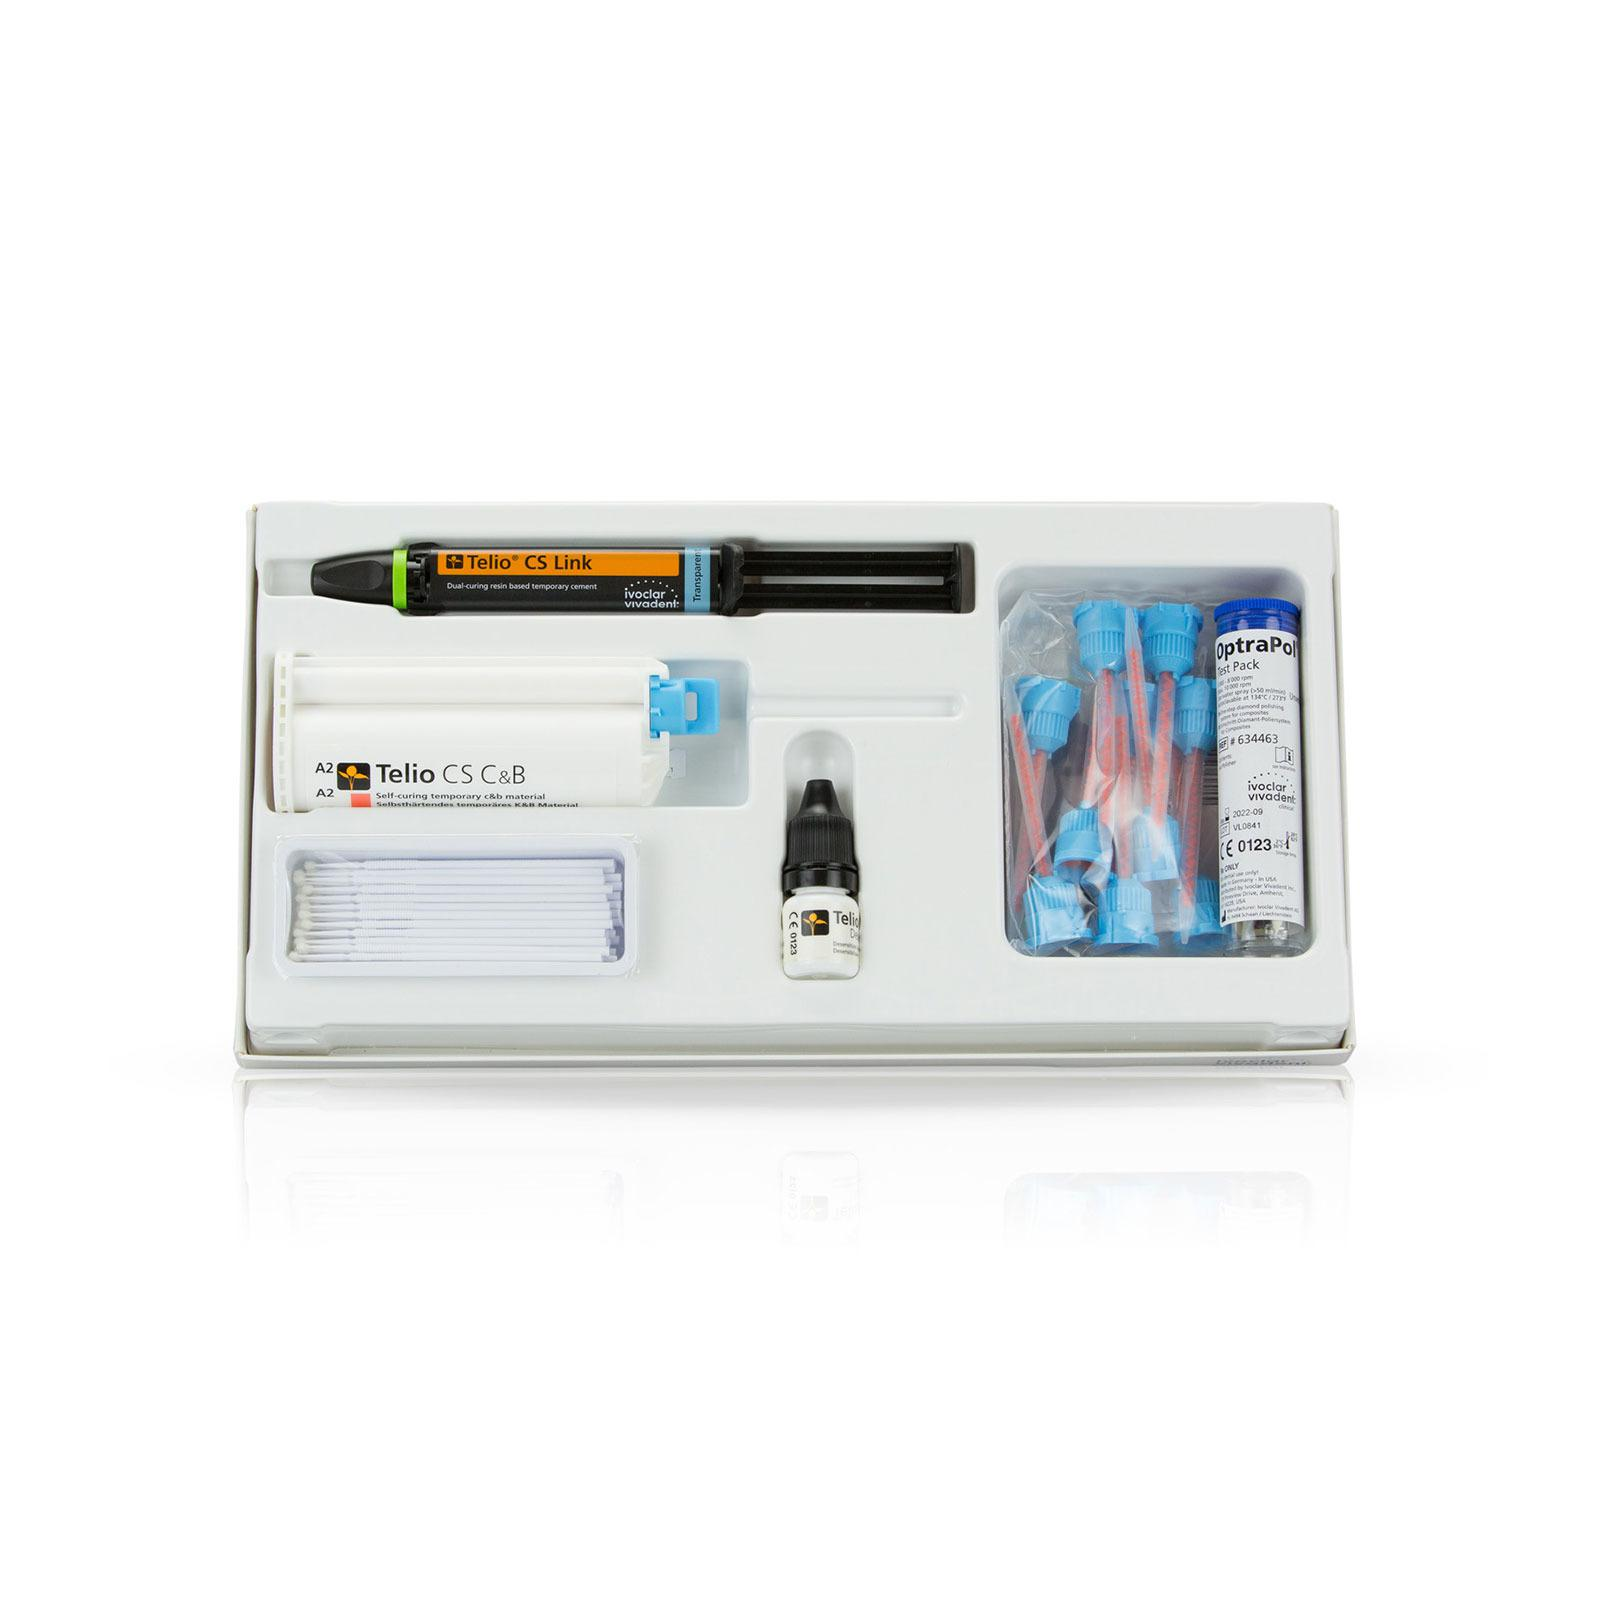 Telio CS C&B Starter Kit A2